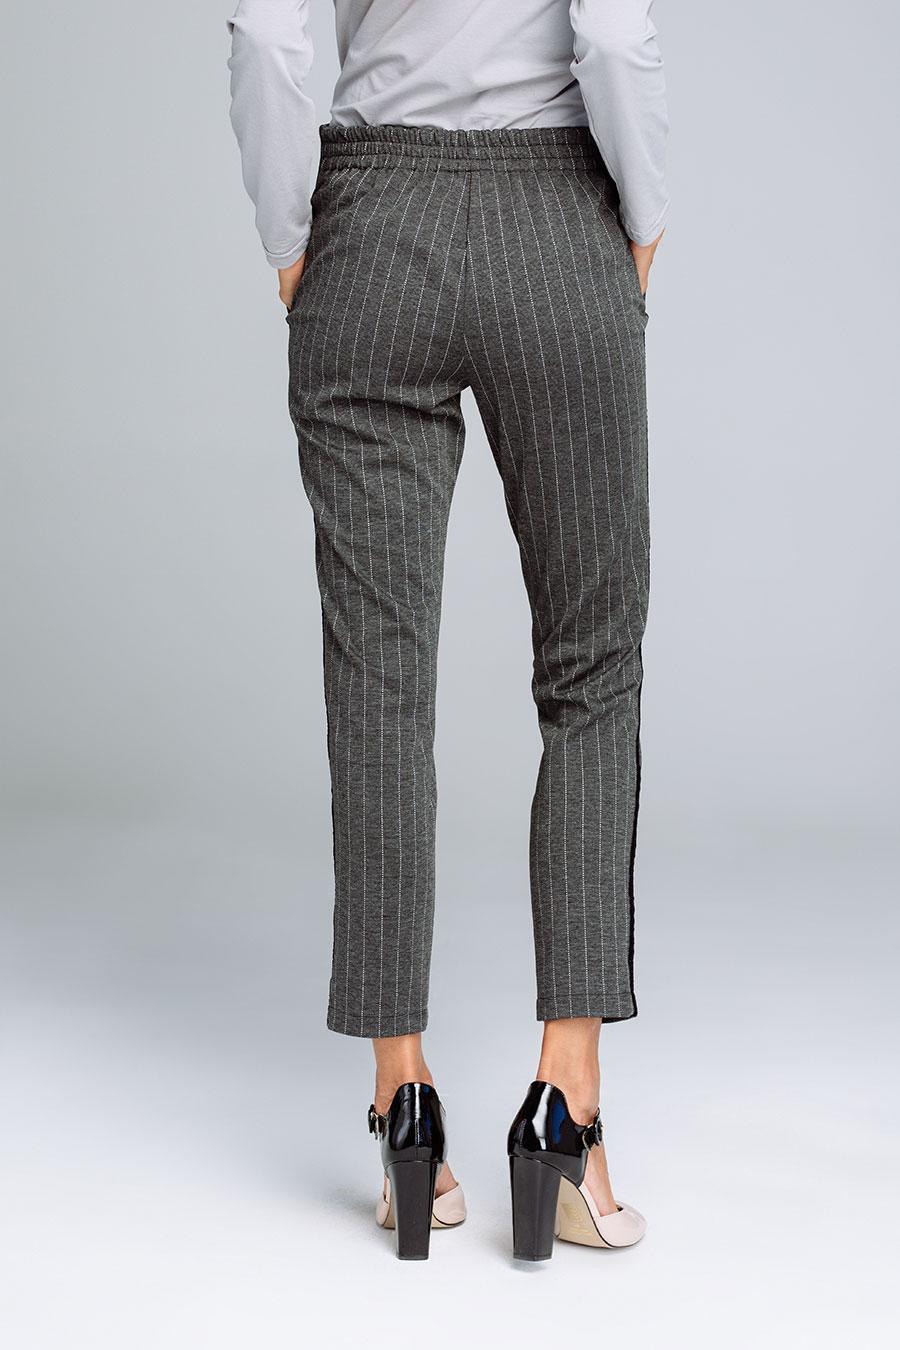 Online Shop Jagger Jagger Zenske Pantalone Jg 1129 05 Kolekcija Jesen Zima 2020 2021 03